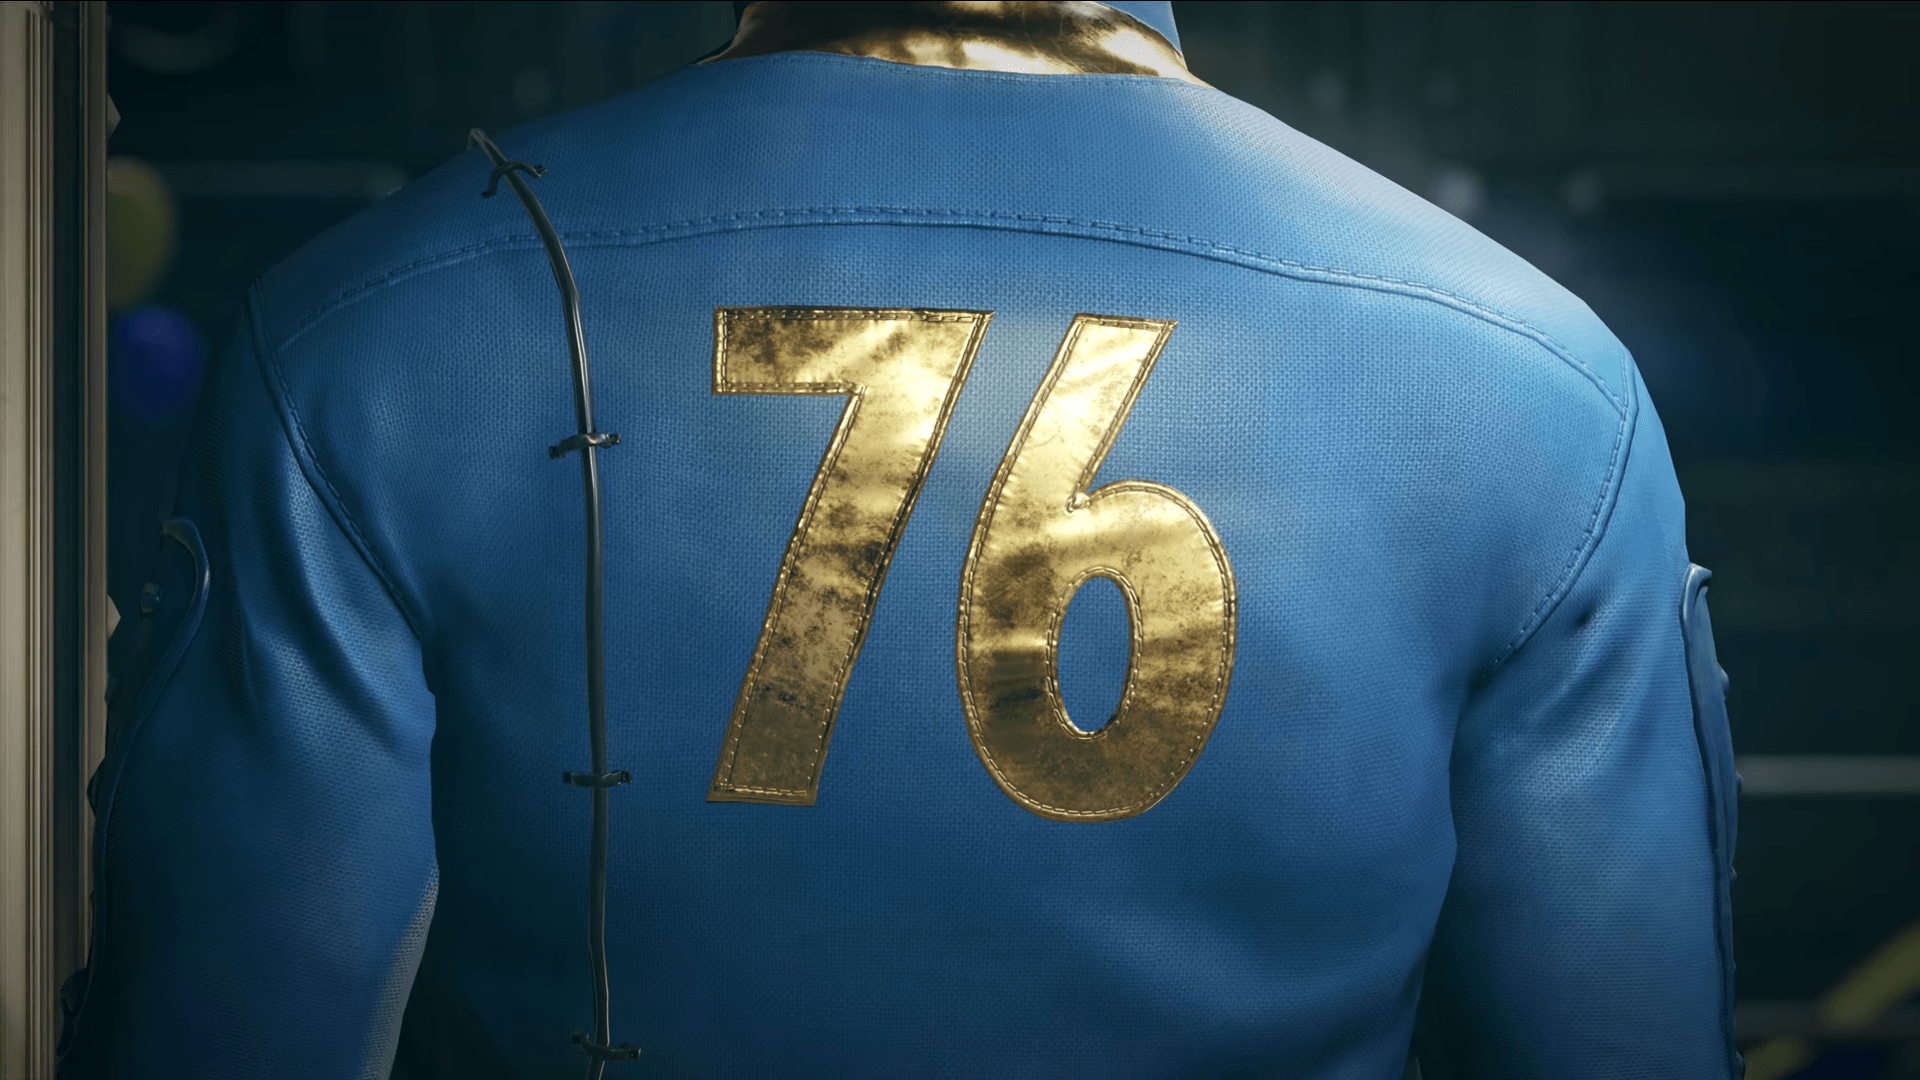 record: כבר בתחילת 2019 נקבל אירועים מיוחדים ב- Fallout 76 cover image